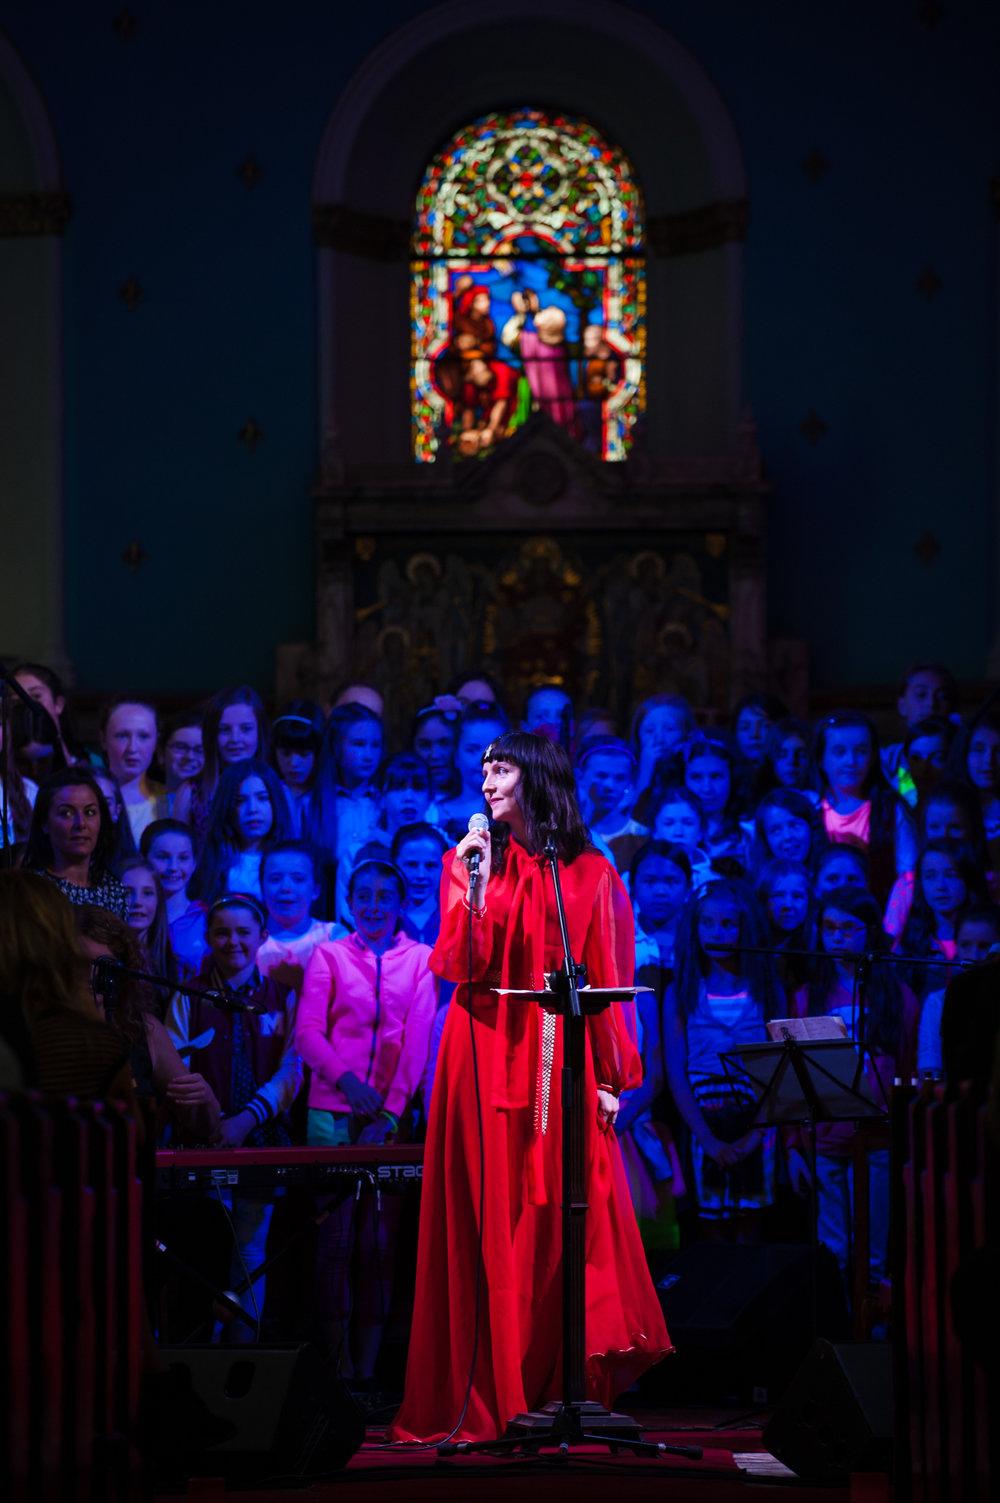 Nina_Hynes_and_choir-Evolving_our_Past-_Rites_of_Passage-_Eoin_Kirwan_photo.jpg